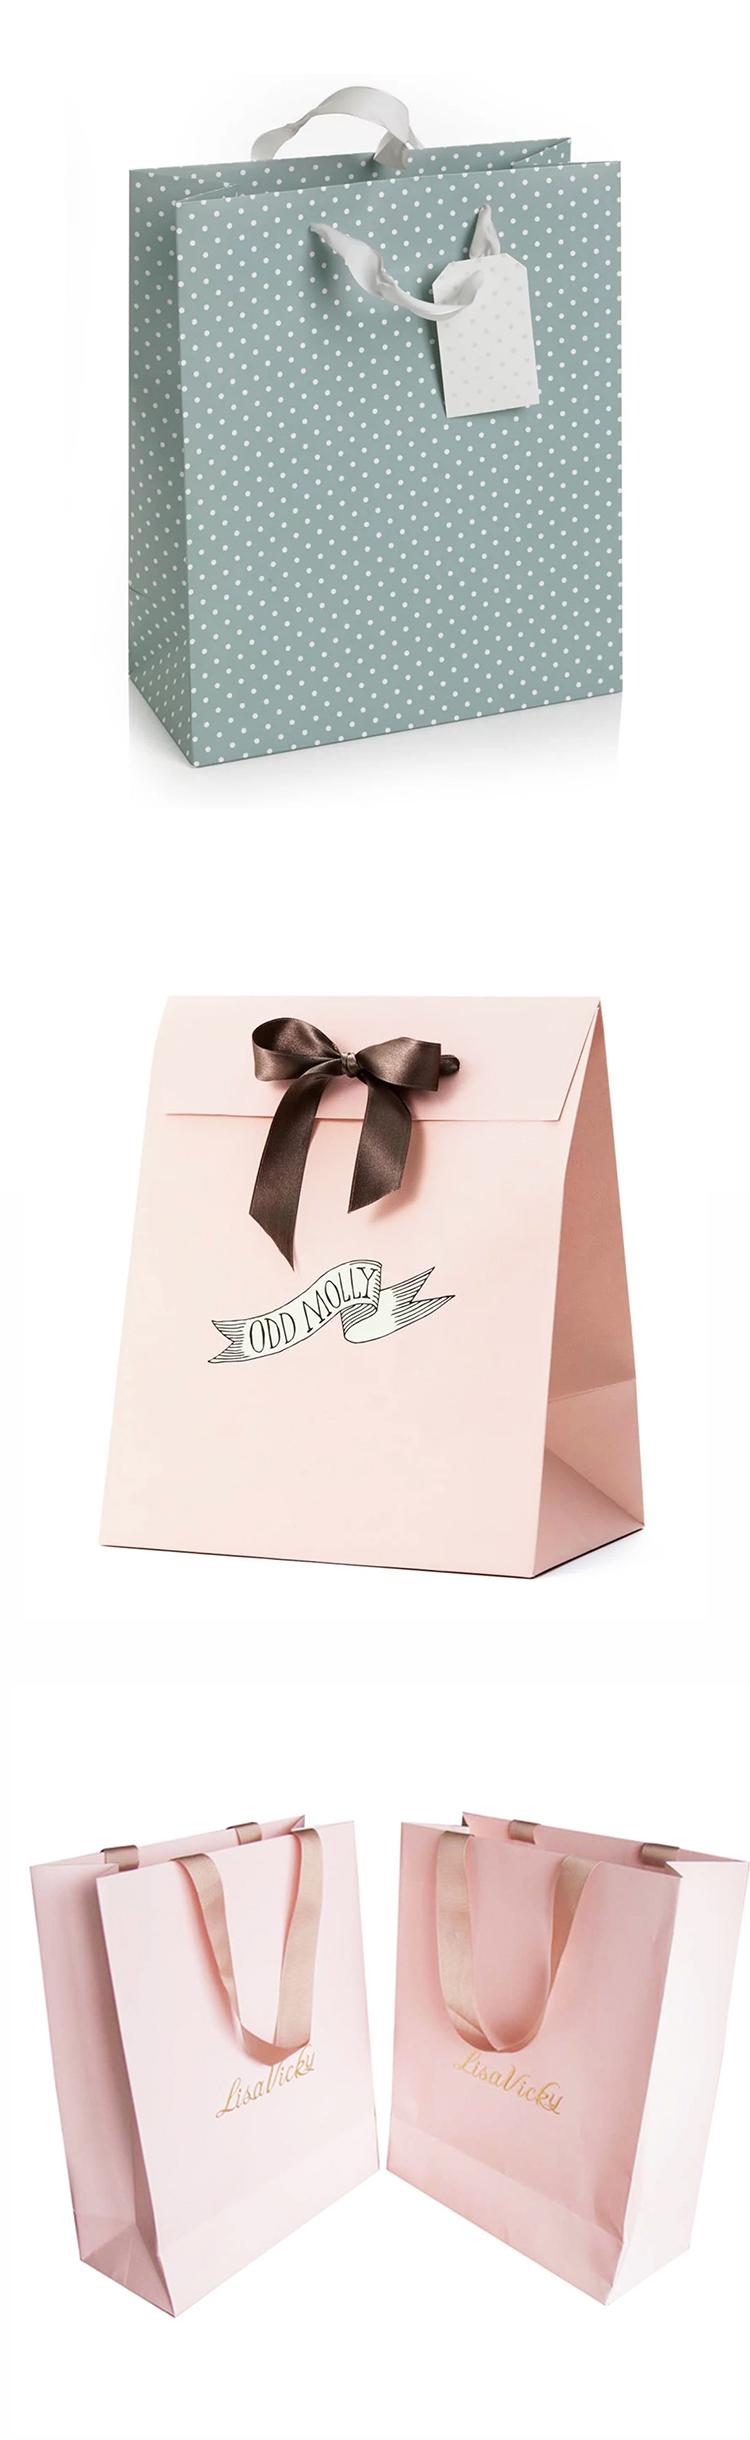 shopping gift paper bag